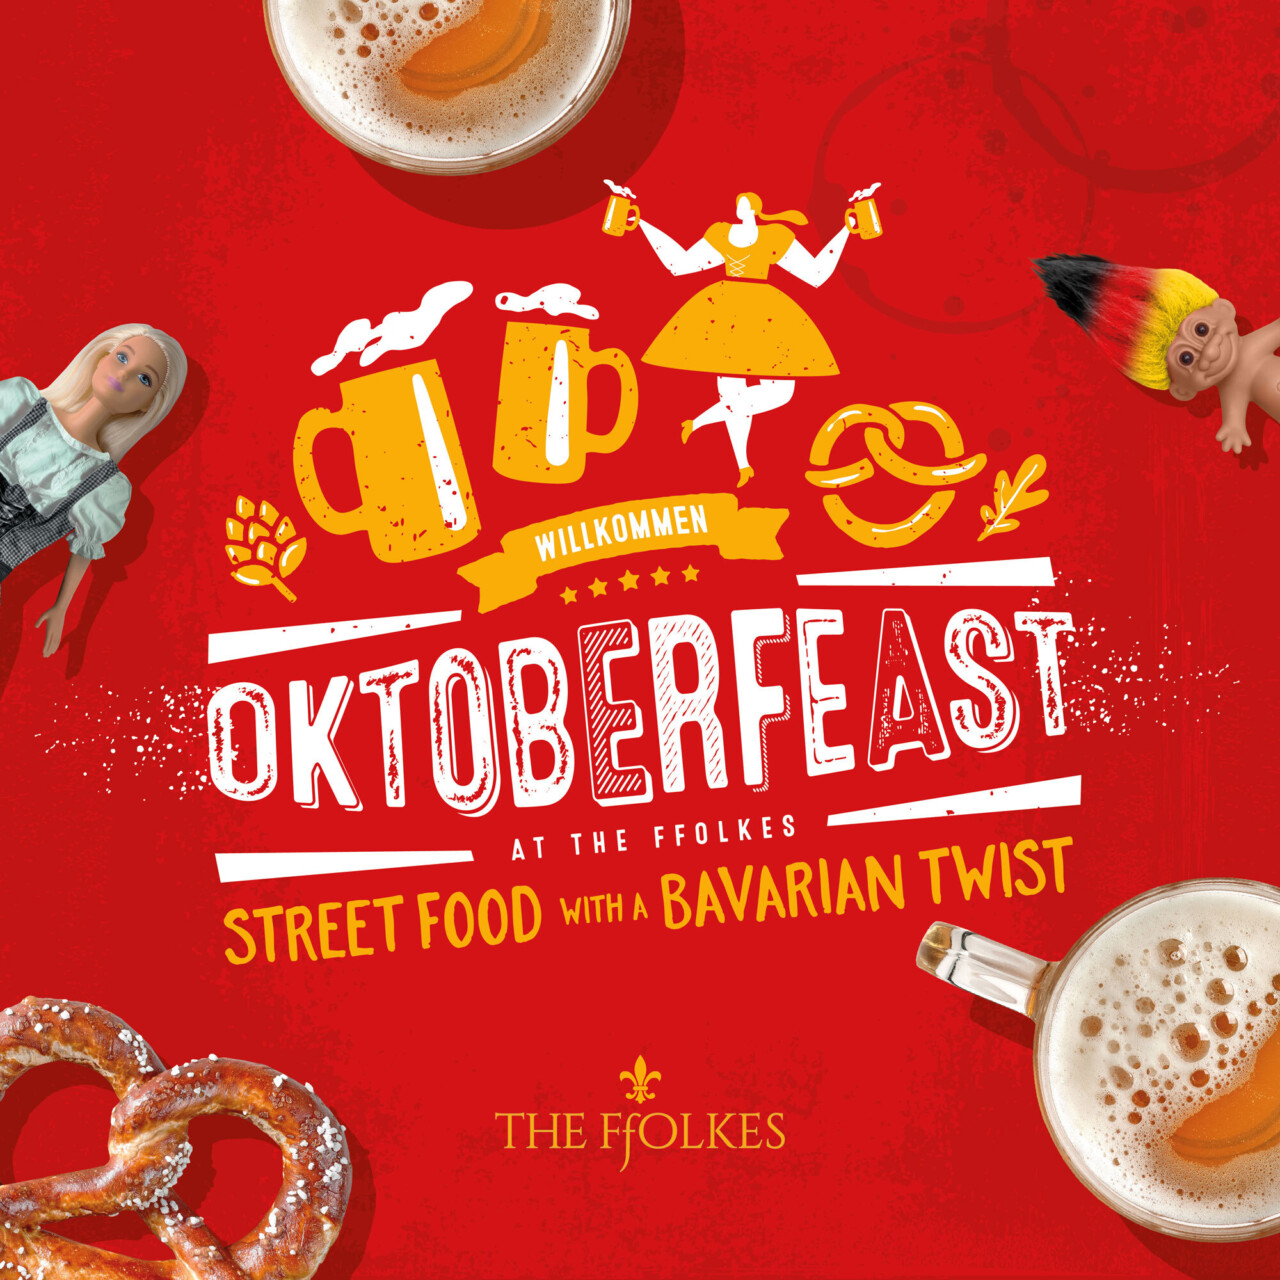 20210830 The Ffolkes Oktober Feast Social Graphic